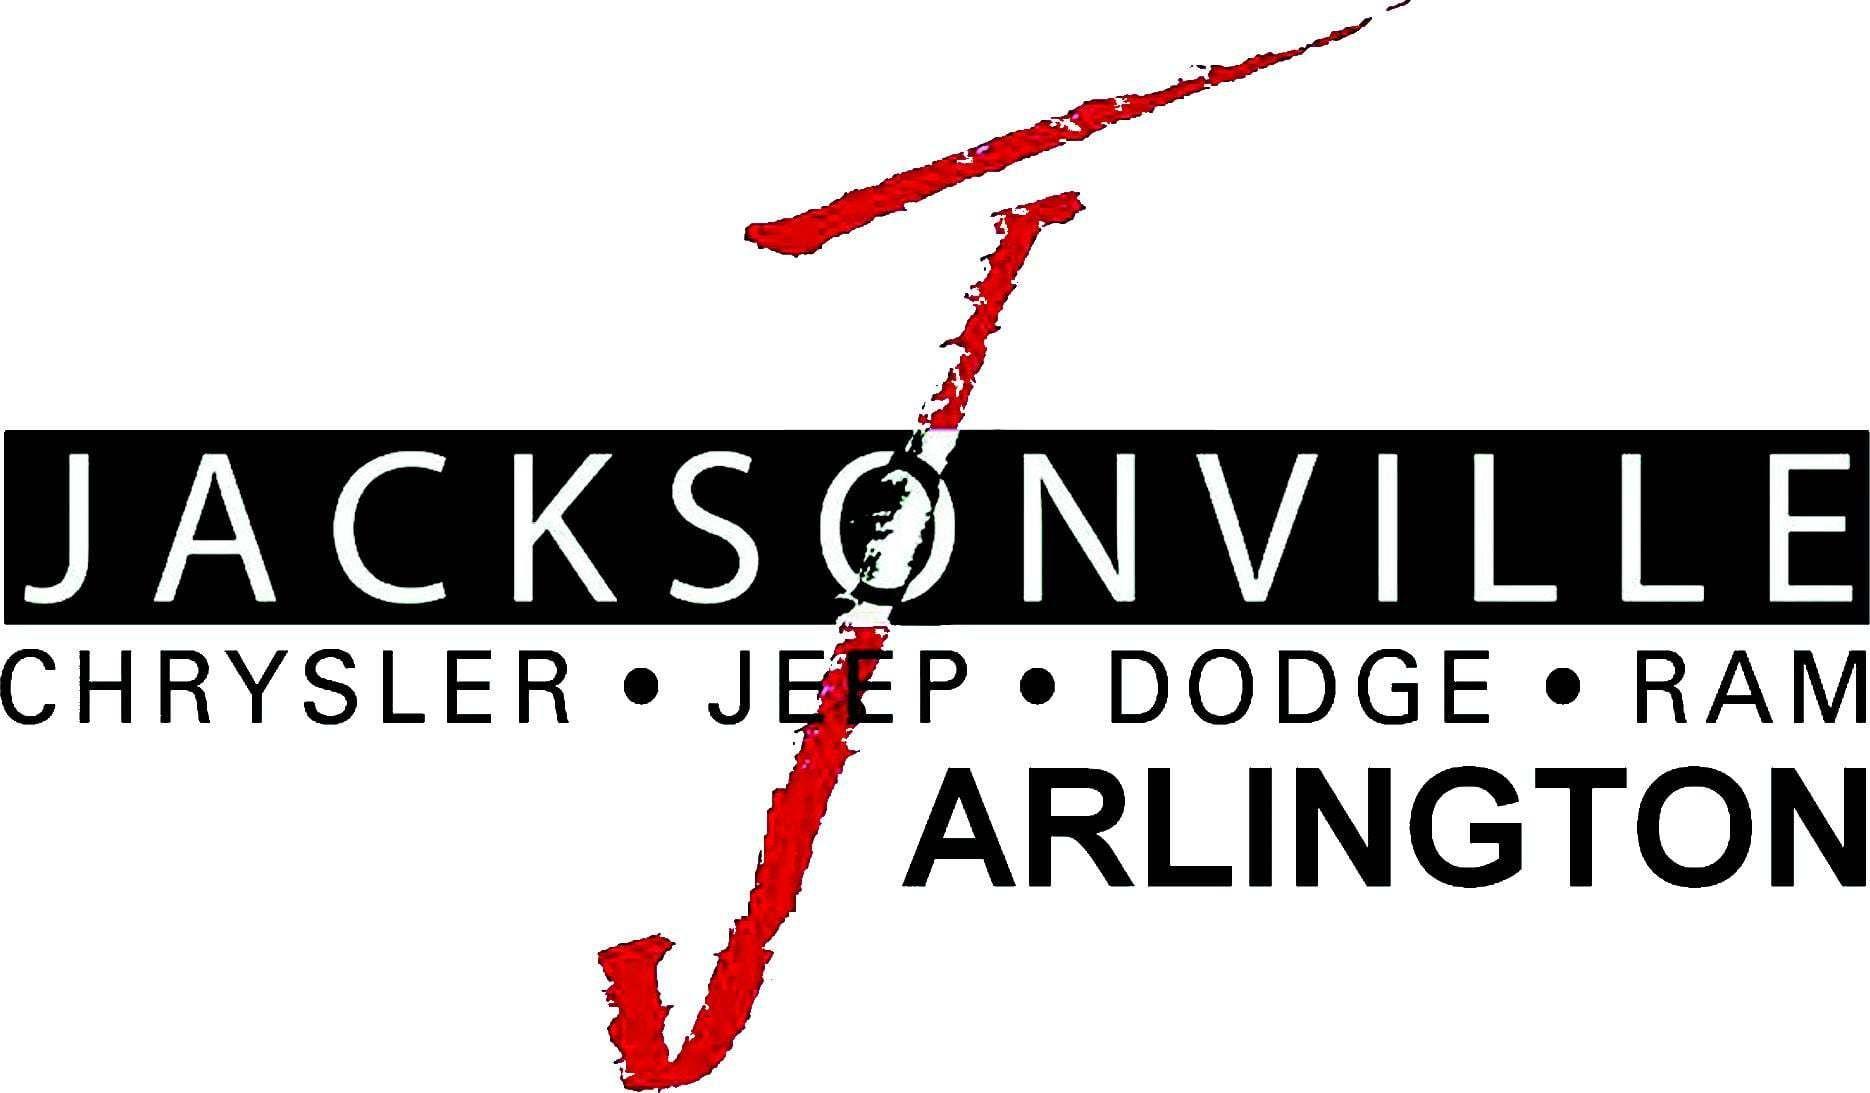 Great Jacksonville Chrysler Jeep Dodge Ram